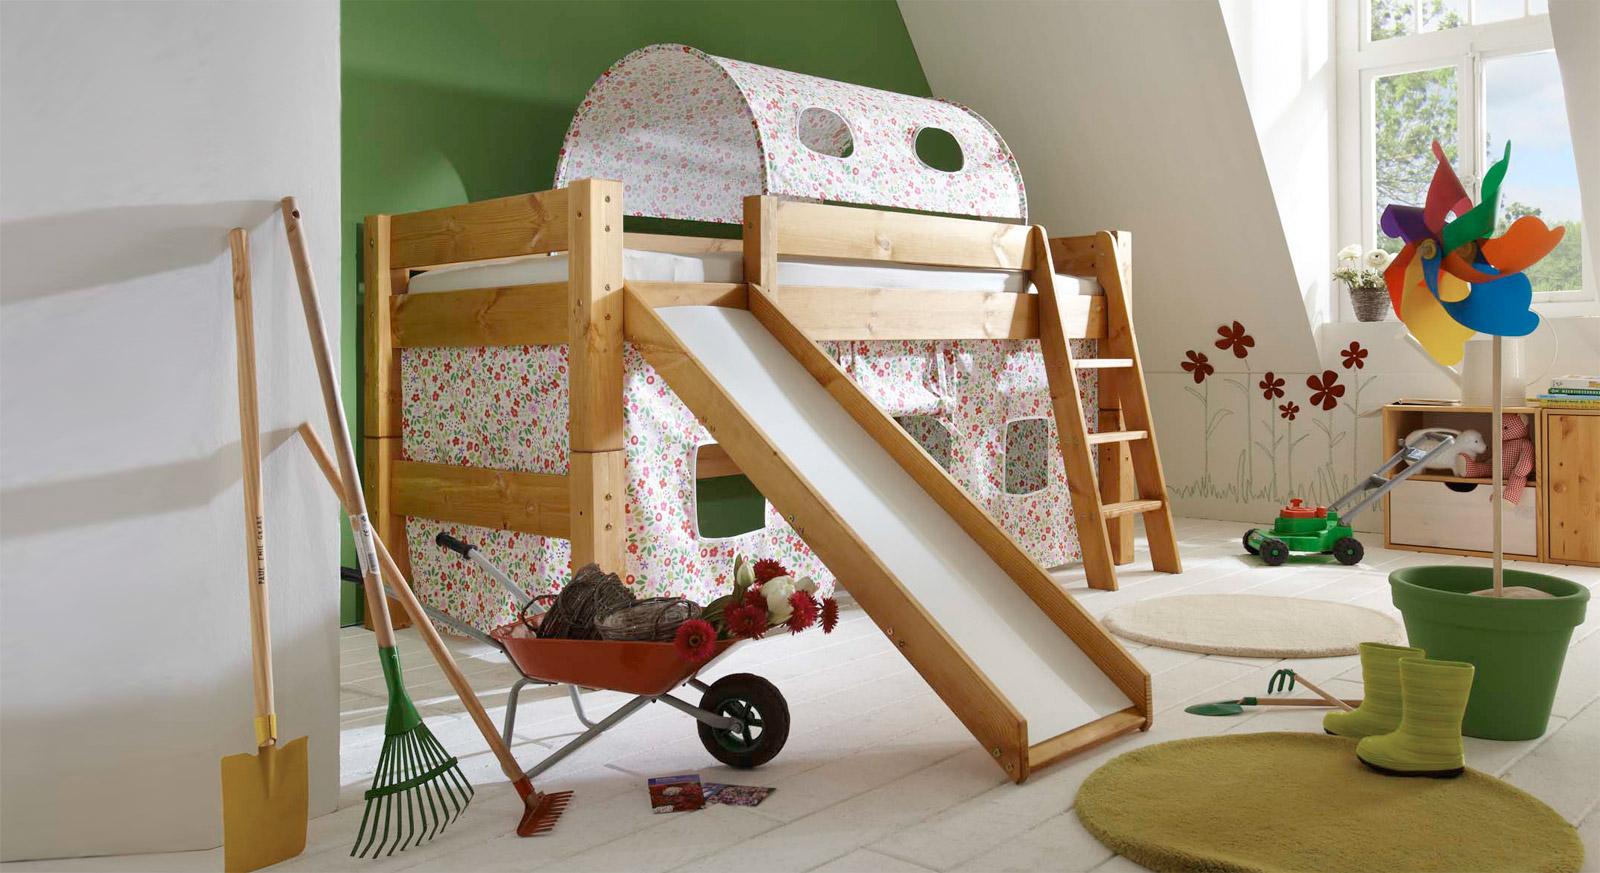 Full Size of Coole Kinderbetten Tolle Mit Rutsche Gnstig Kaufen Bettende Treca Betten T Shirt Sprüche T Shirt Wohnzimmer Coole Kinderbetten